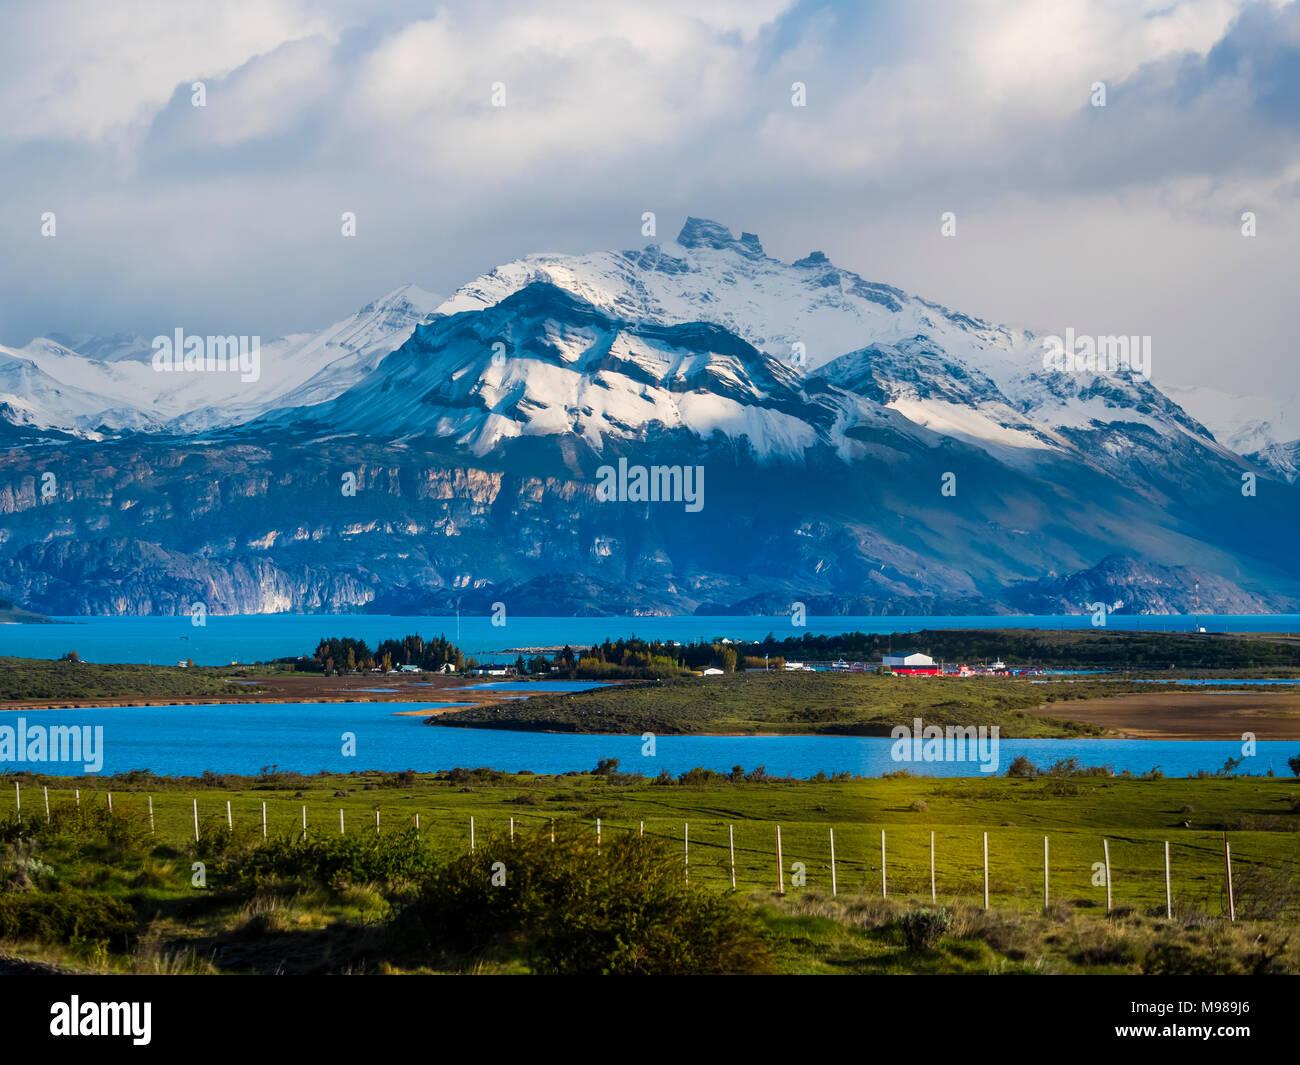 Argentina, Patagonia, El Calafate, Santa Cruz Province, Puerto Bandera, Lago Argentino - Stock Image